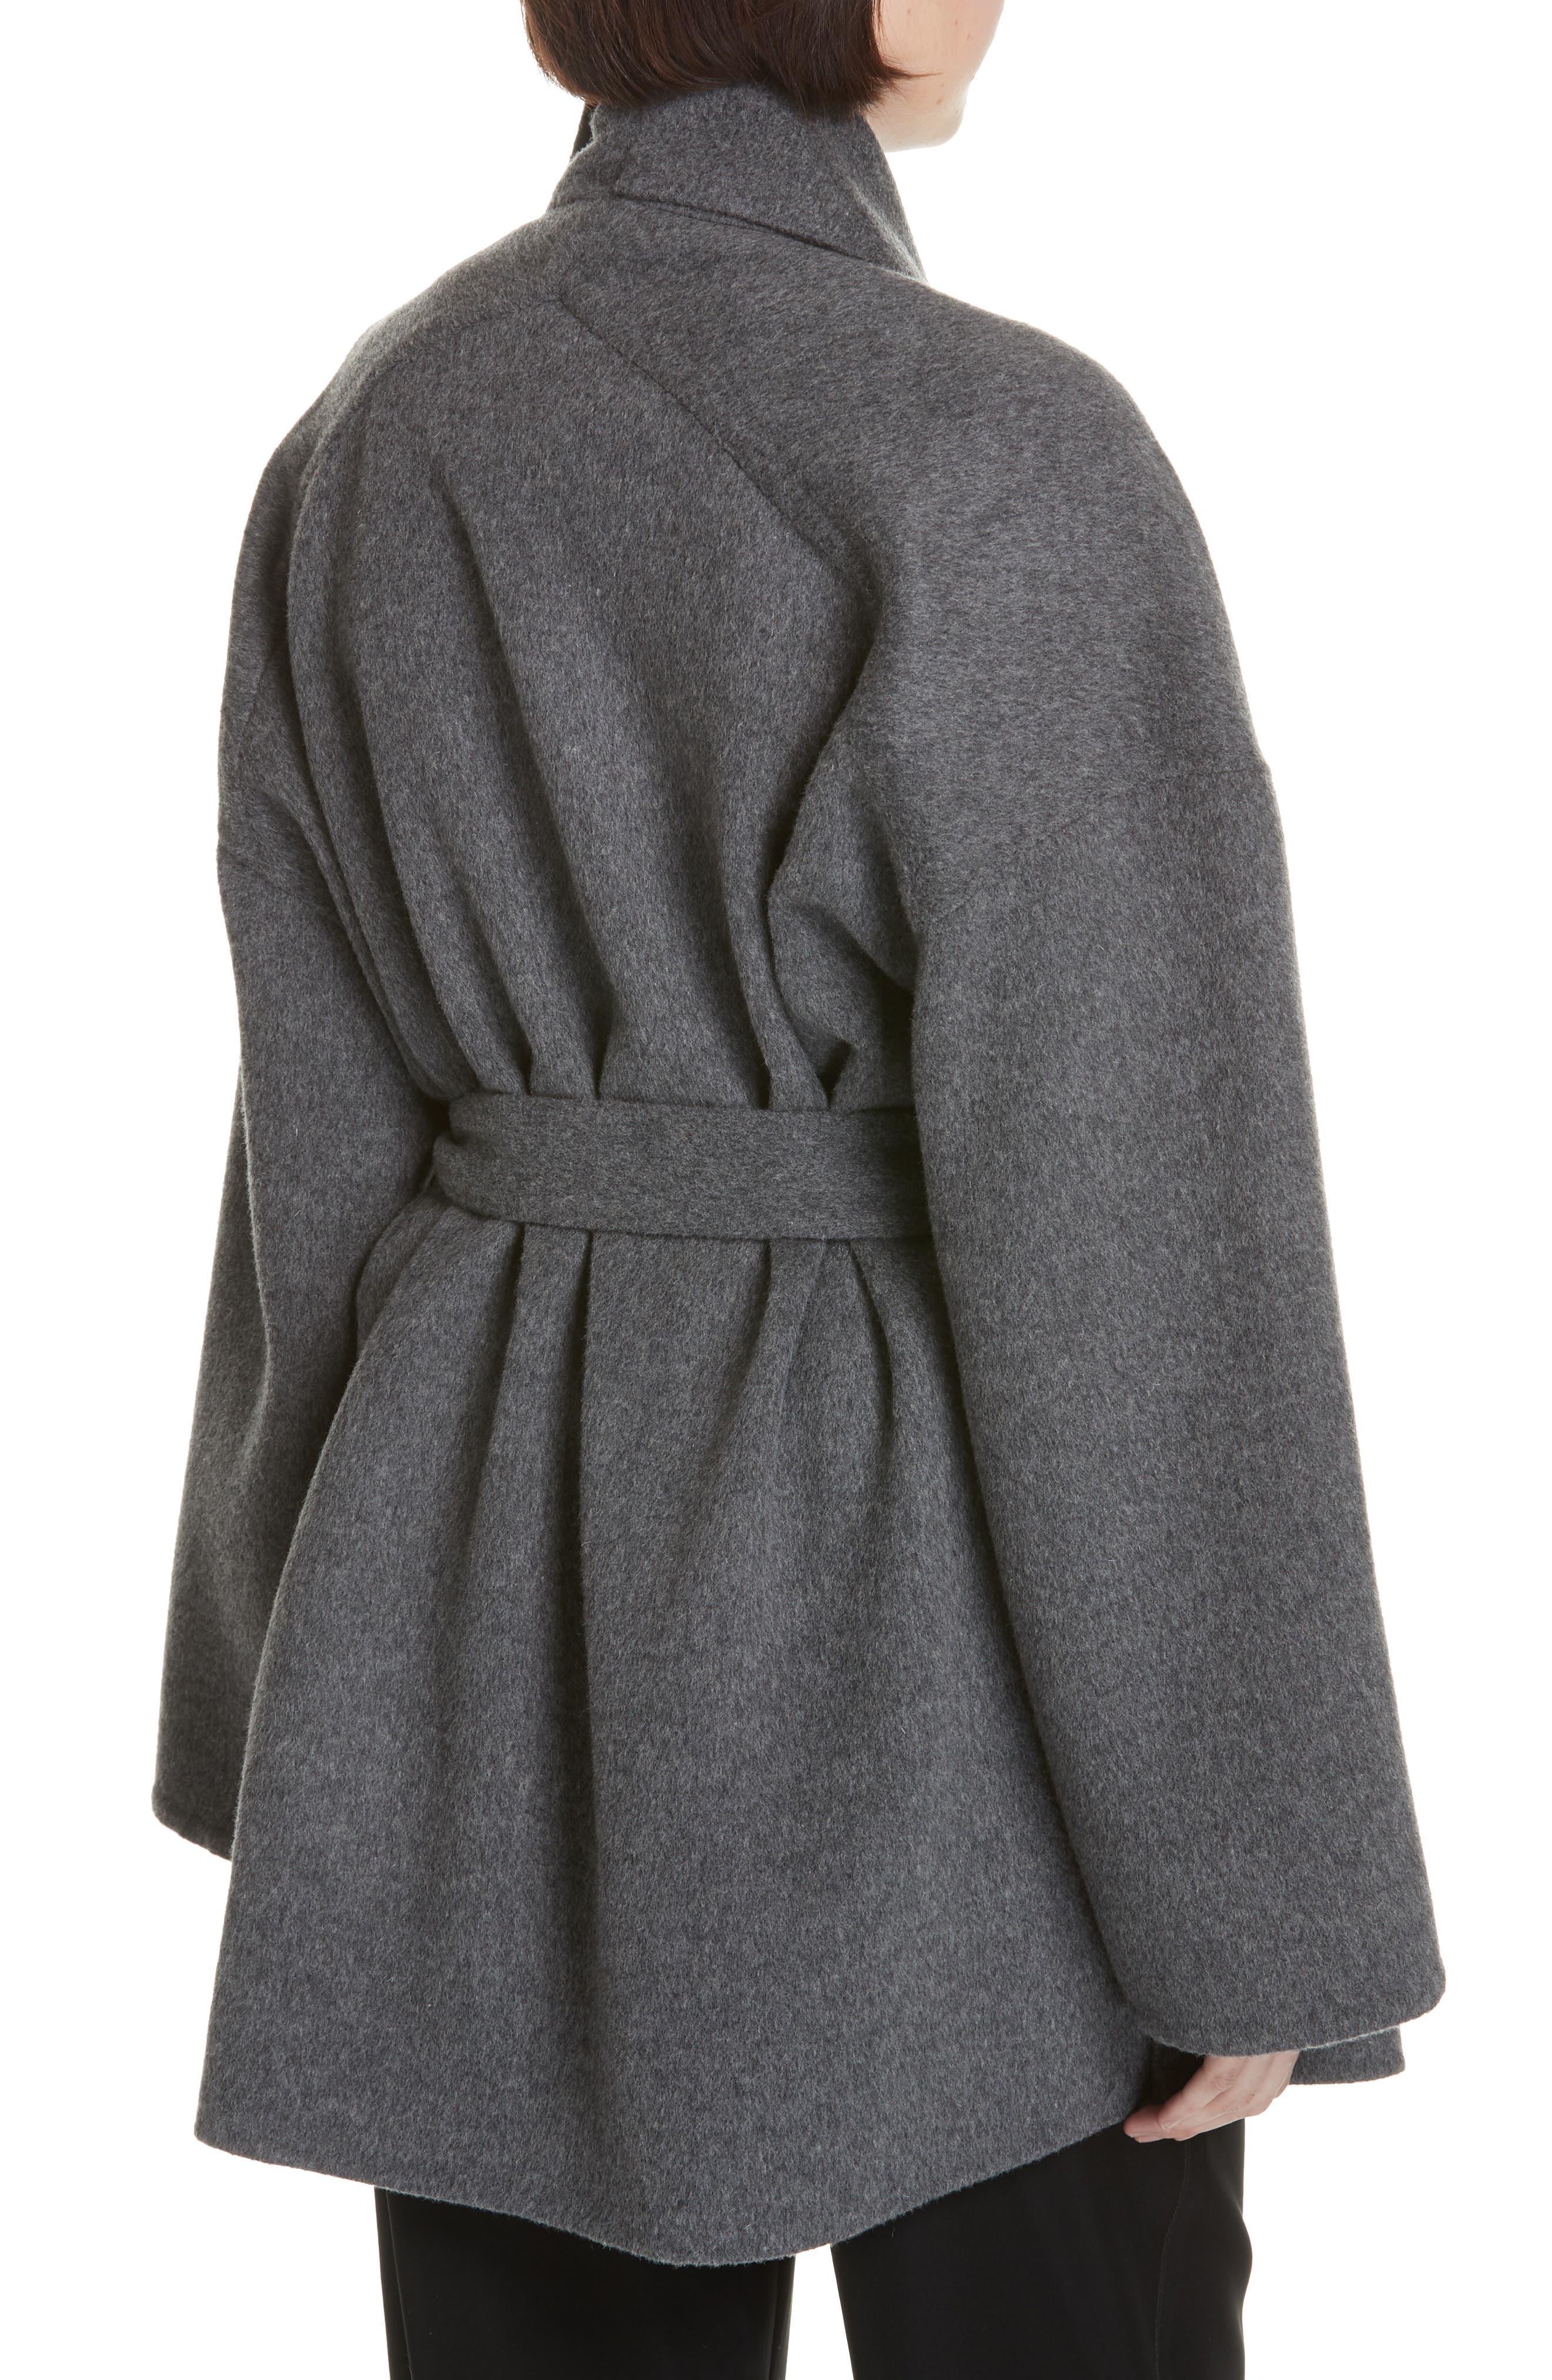 Blanket Coat,                             Alternate thumbnail 2, color,                             H GREY